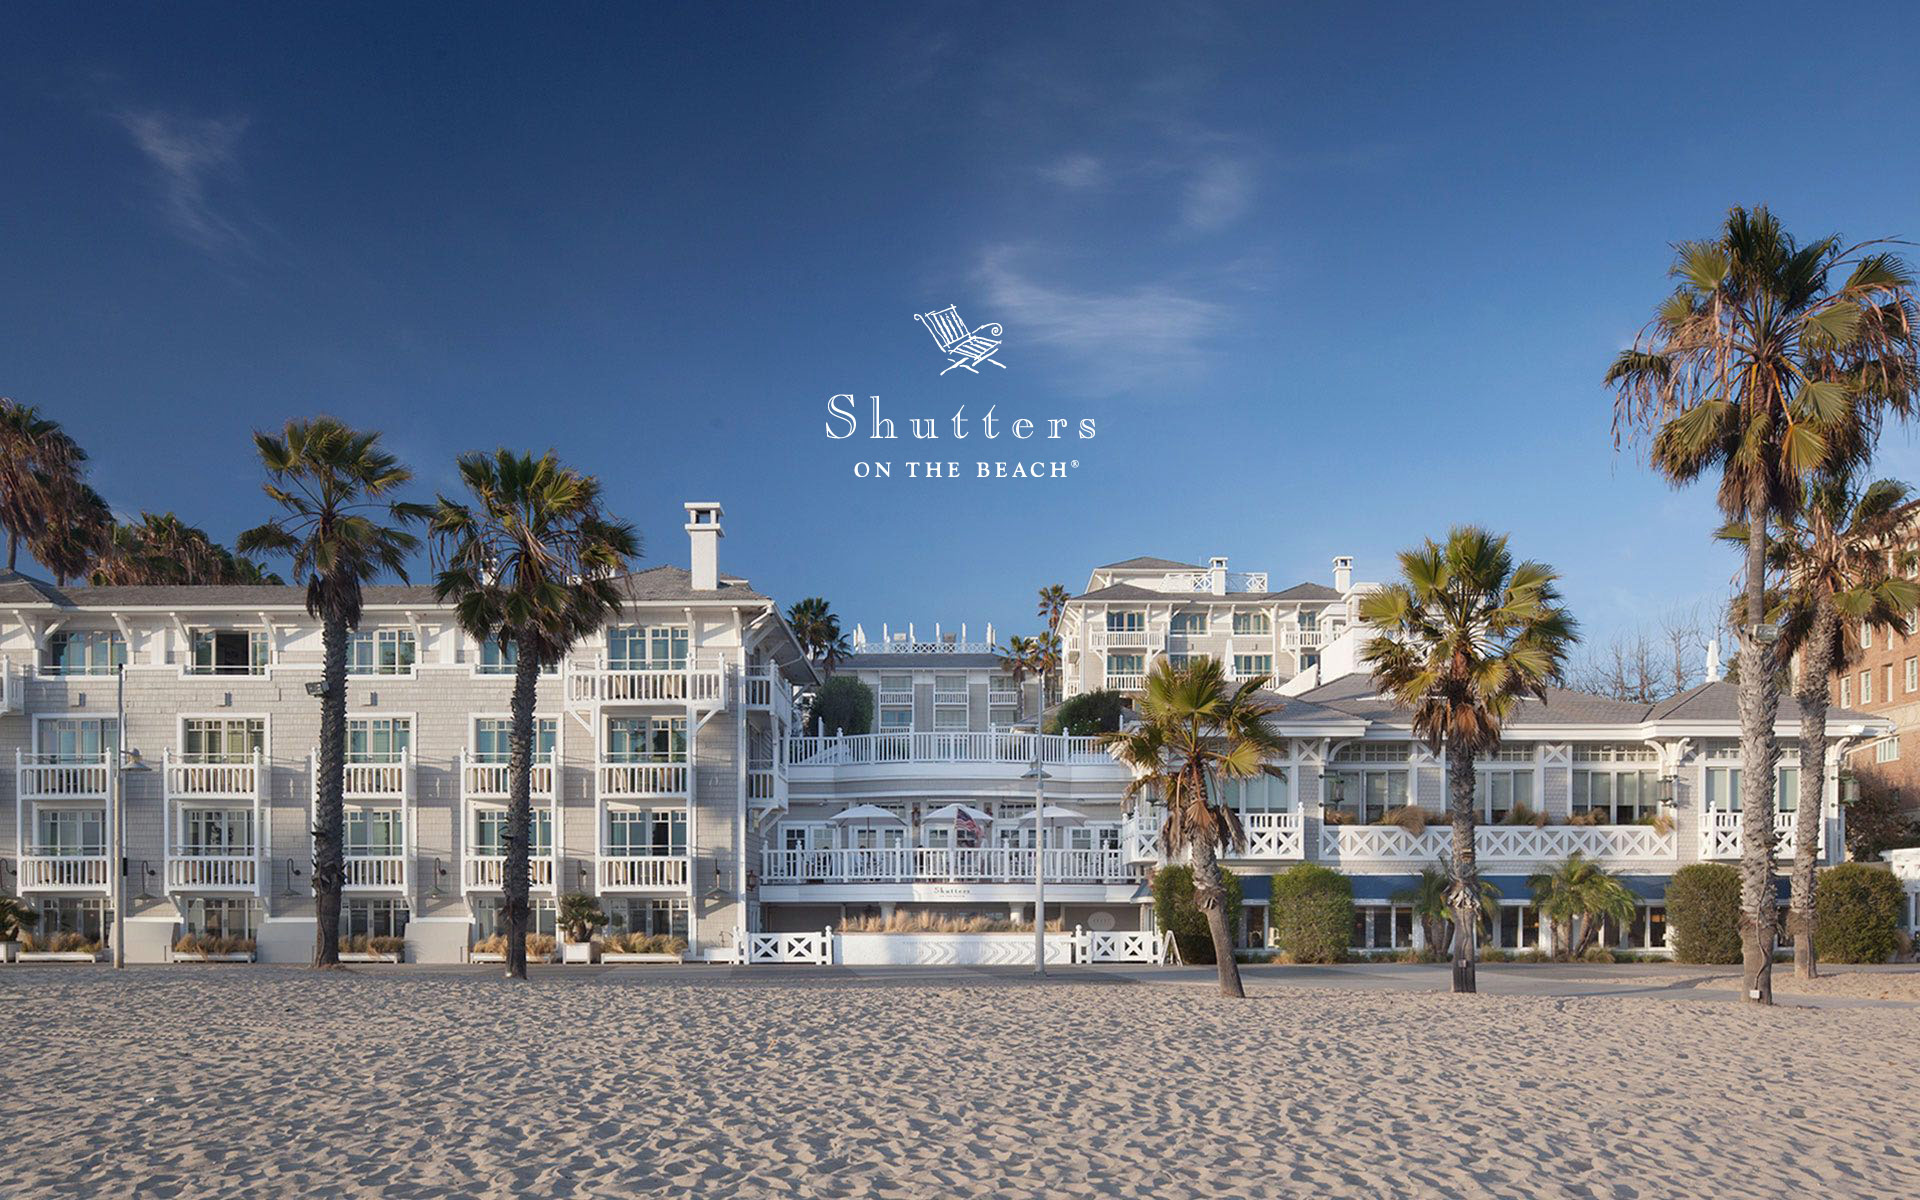 Santa Monica Hotel - Luxury Beach Hotel | The Iconic